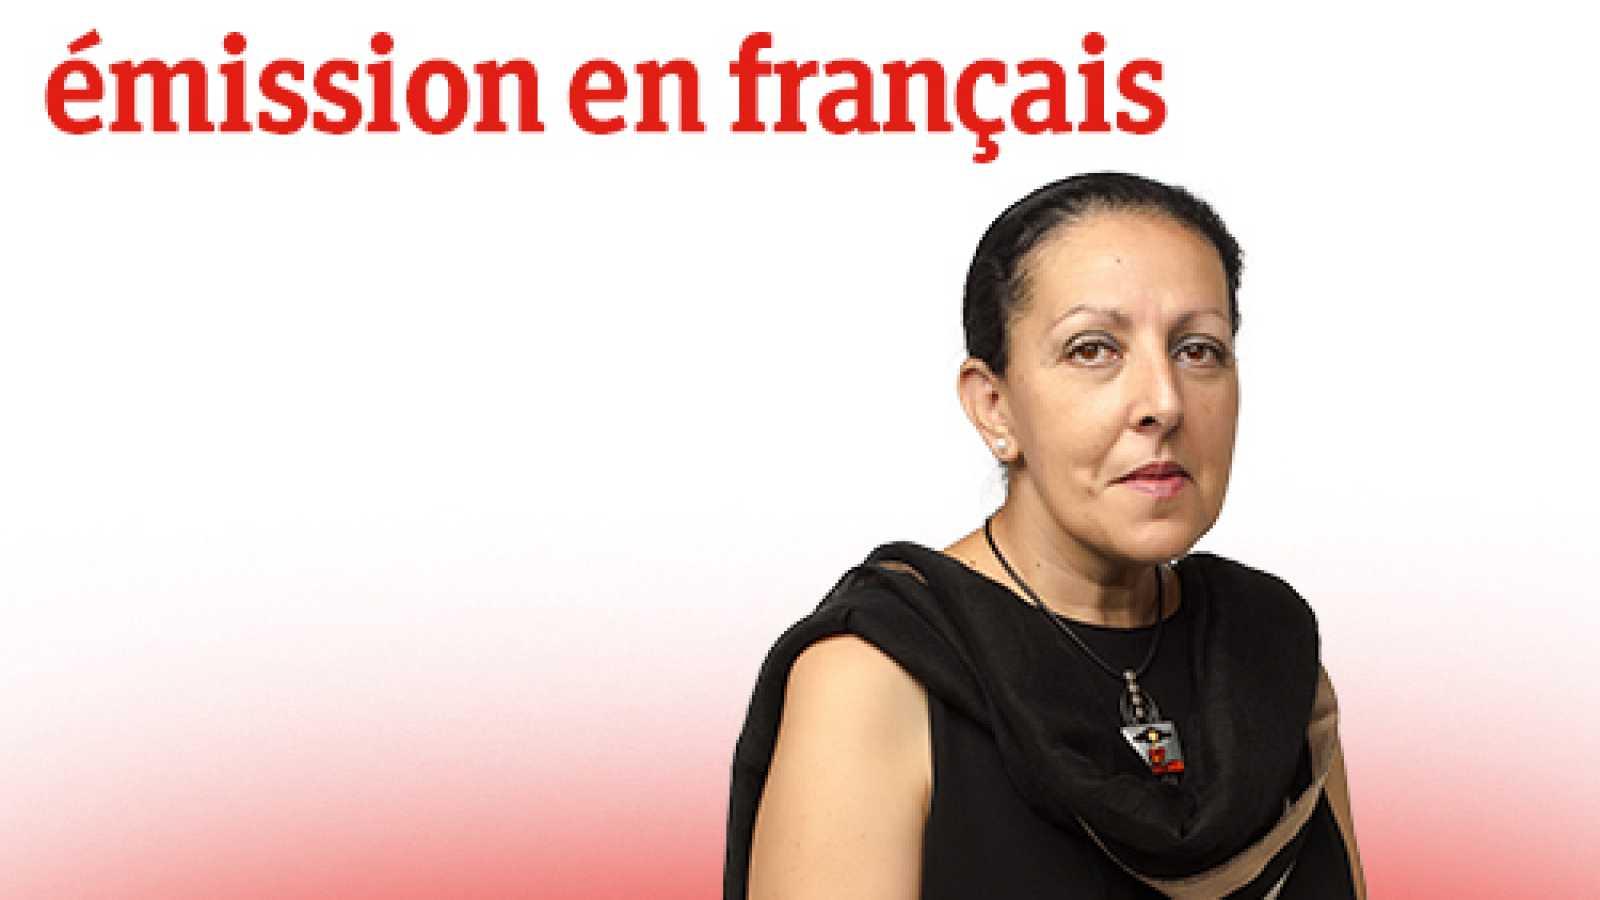 Emission en Français - Sahara occidental s'invite à Paris - 28/11/20 - Escuchar ahora